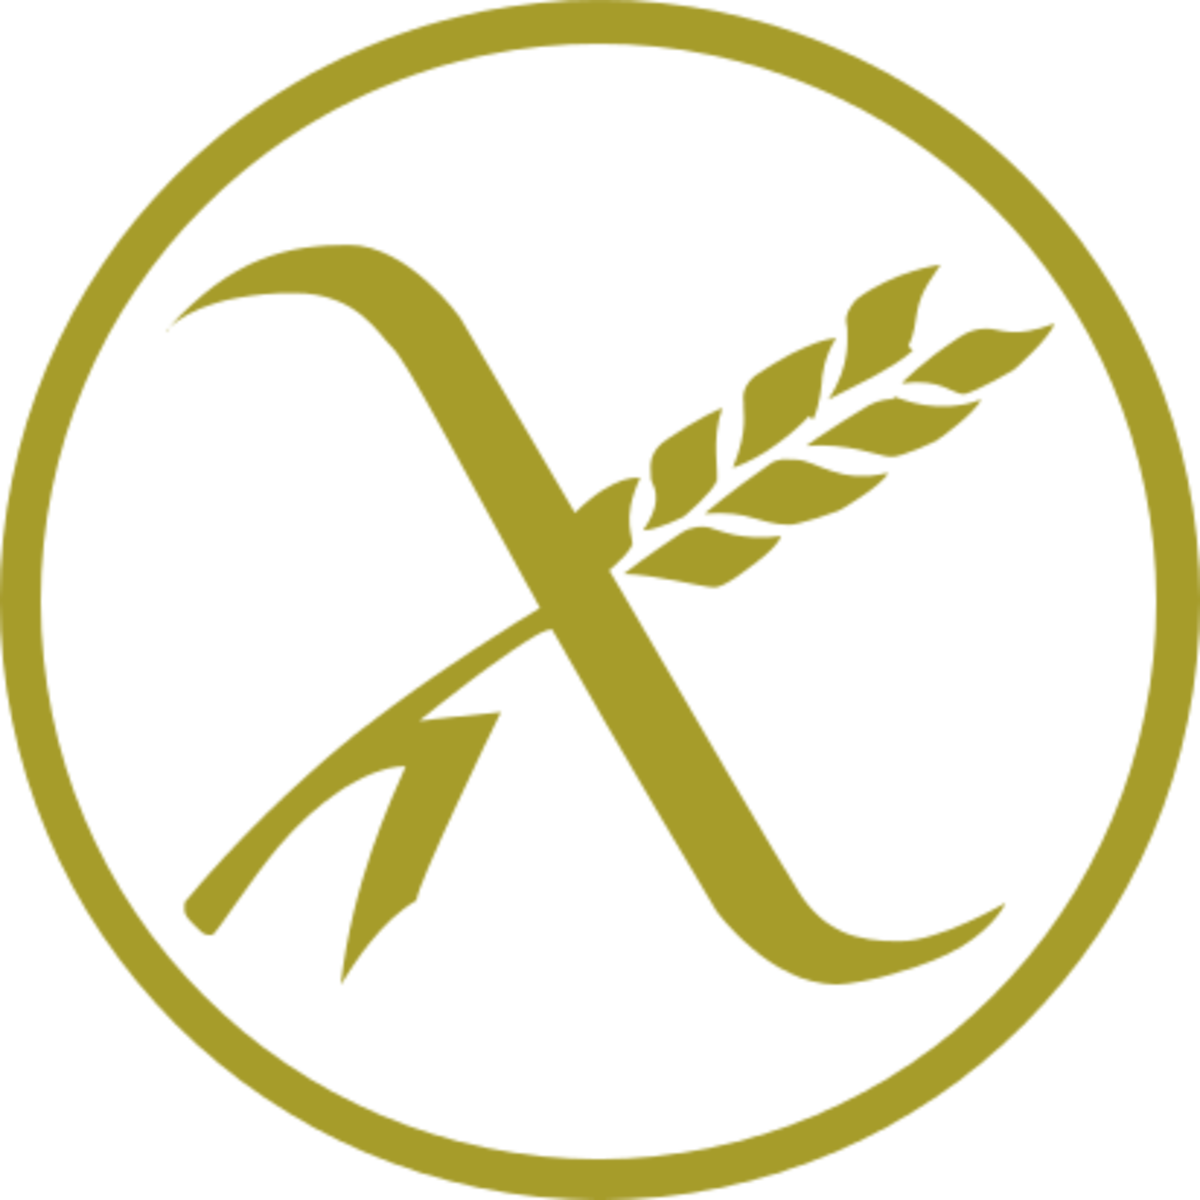 Gluten-free symbol.